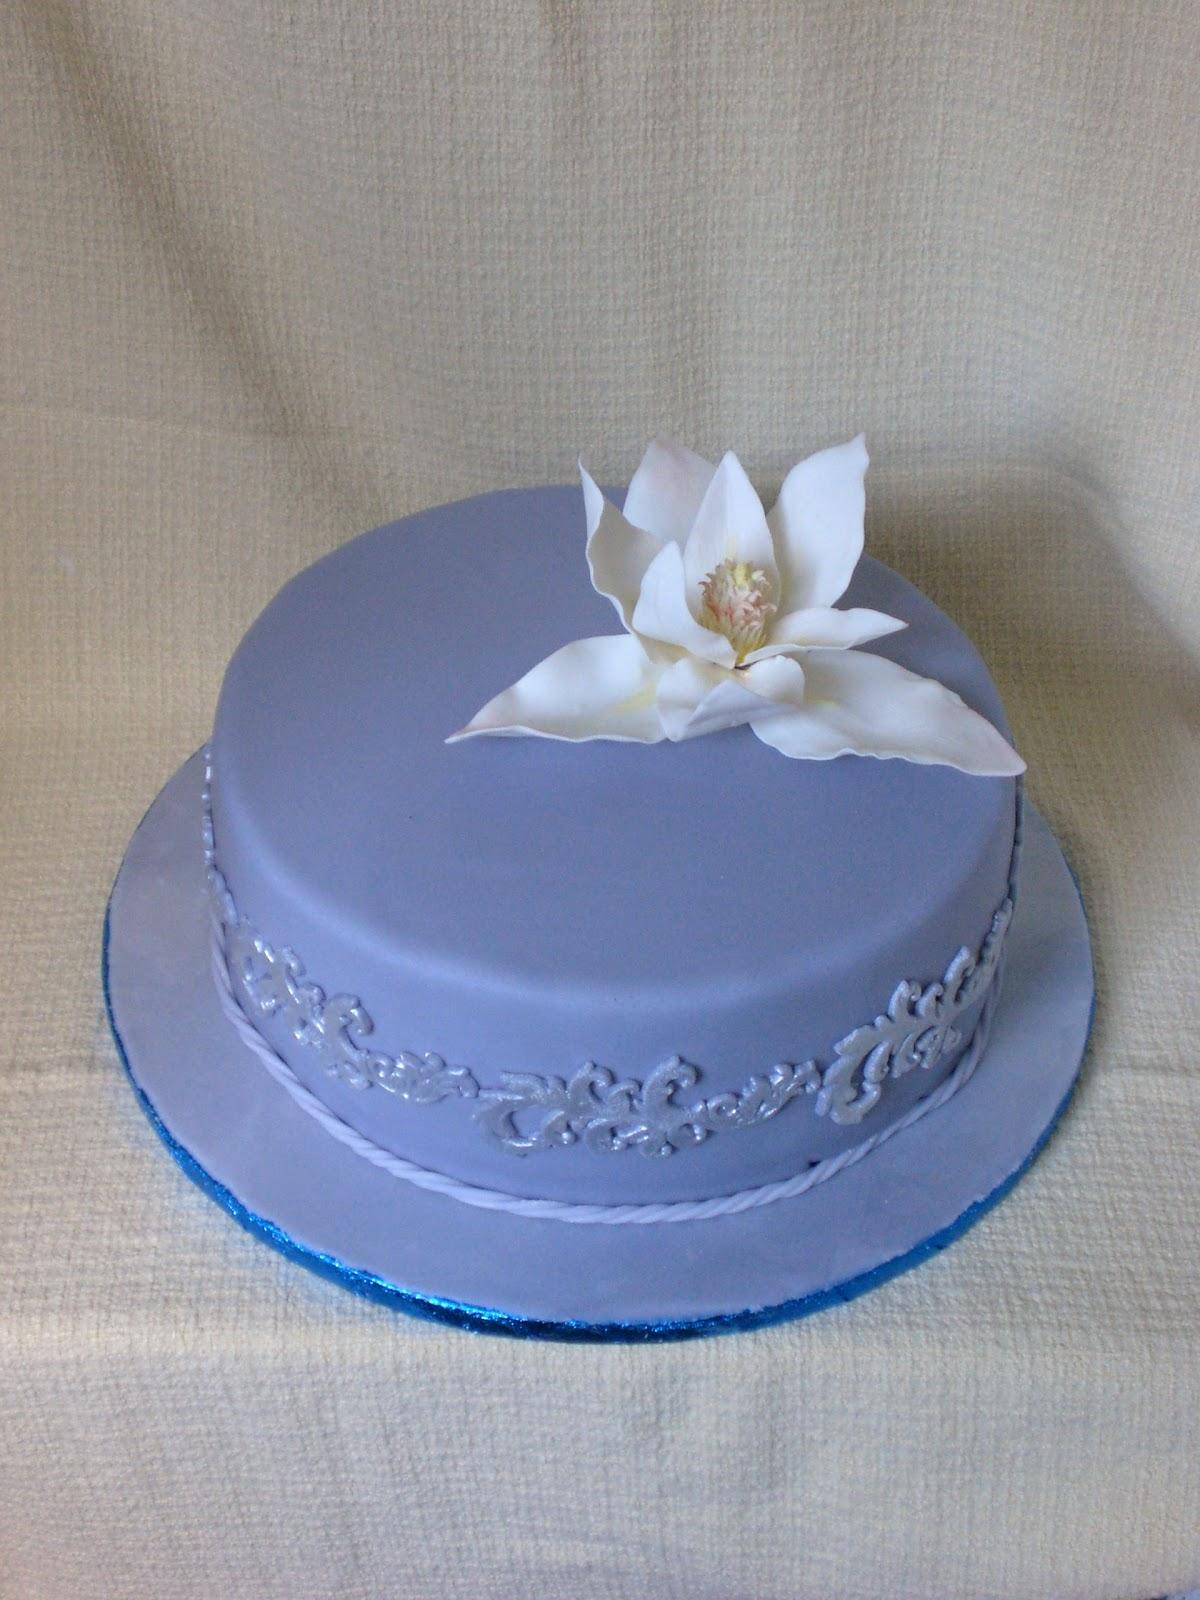 geburtstagstorte zum 50 christina 39 s catchy cakes. Black Bedroom Furniture Sets. Home Design Ideas